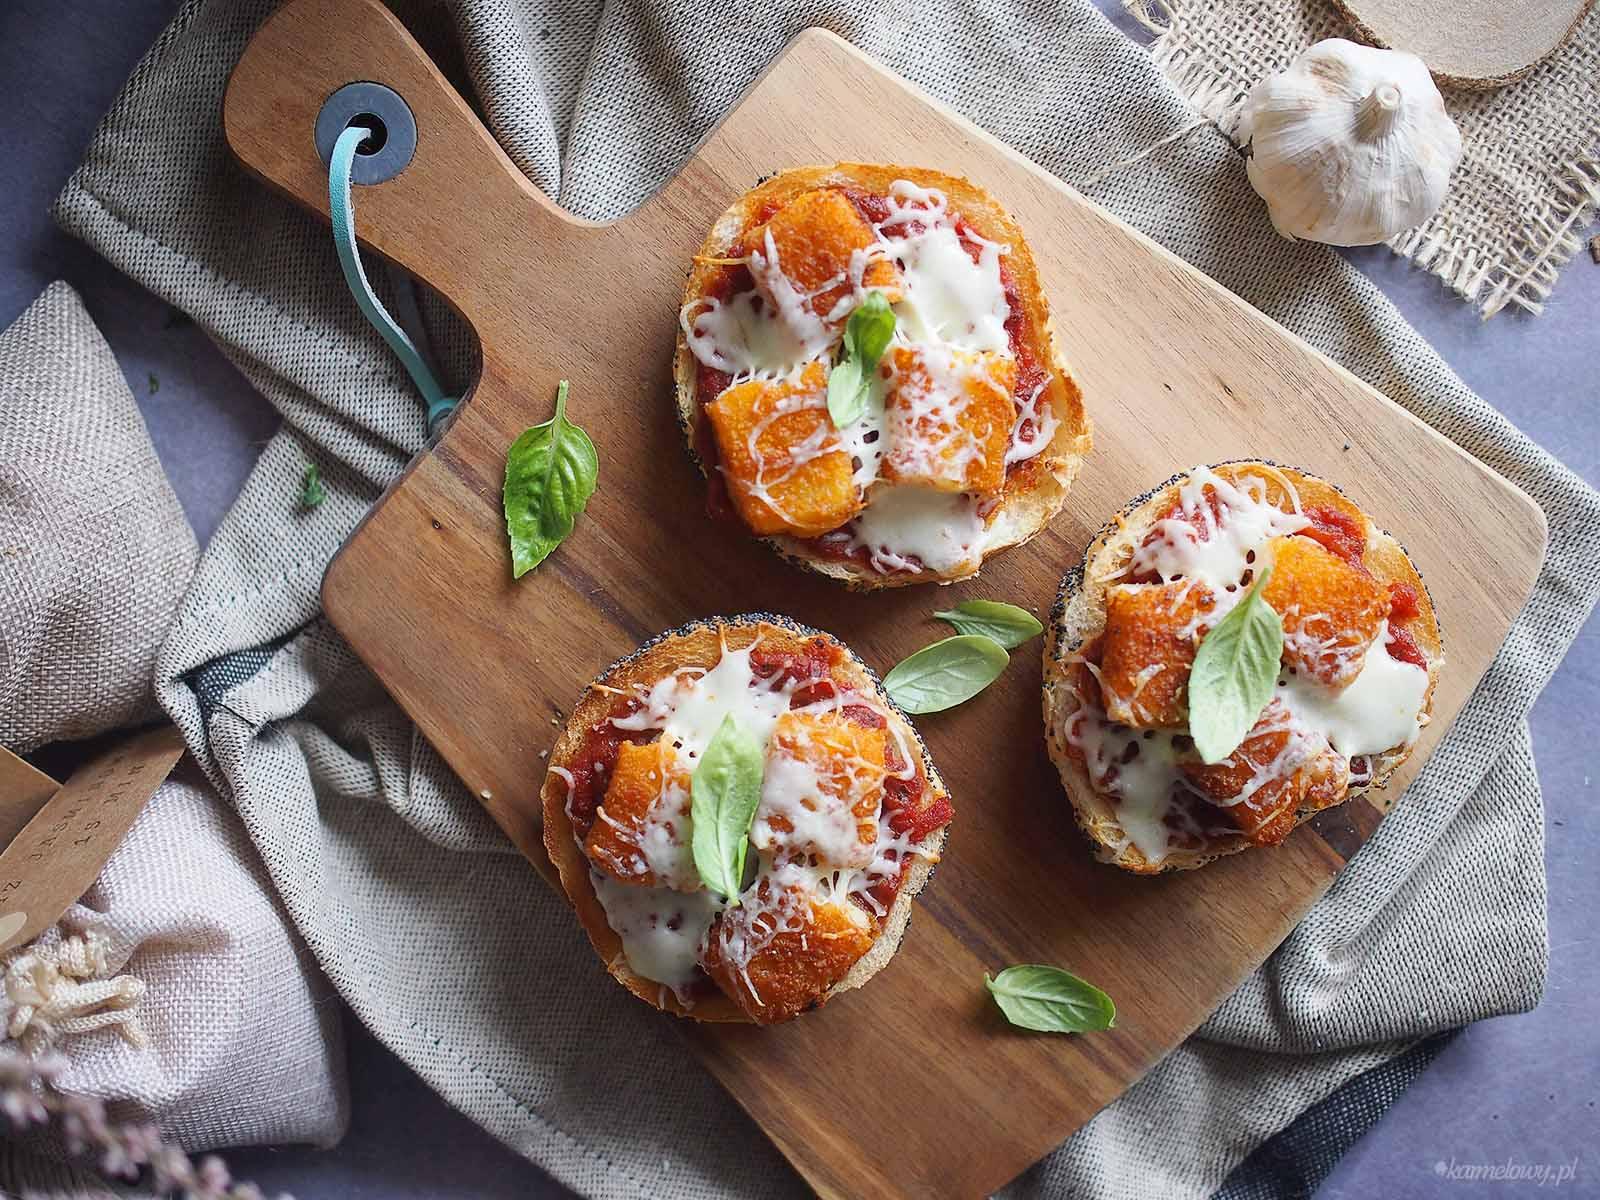 Zapiekane-kanapki-z-paluszkami-rybnymi-i-mozzarella-Fish-sticks-and-mozzarella-toasts